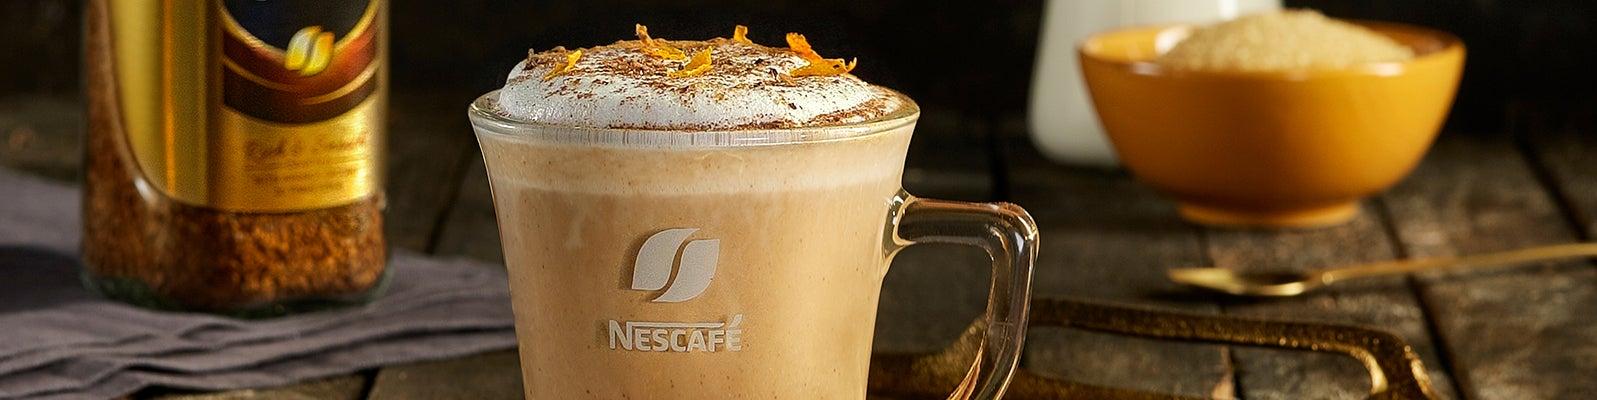 Nescafe Pumpkin LAtte